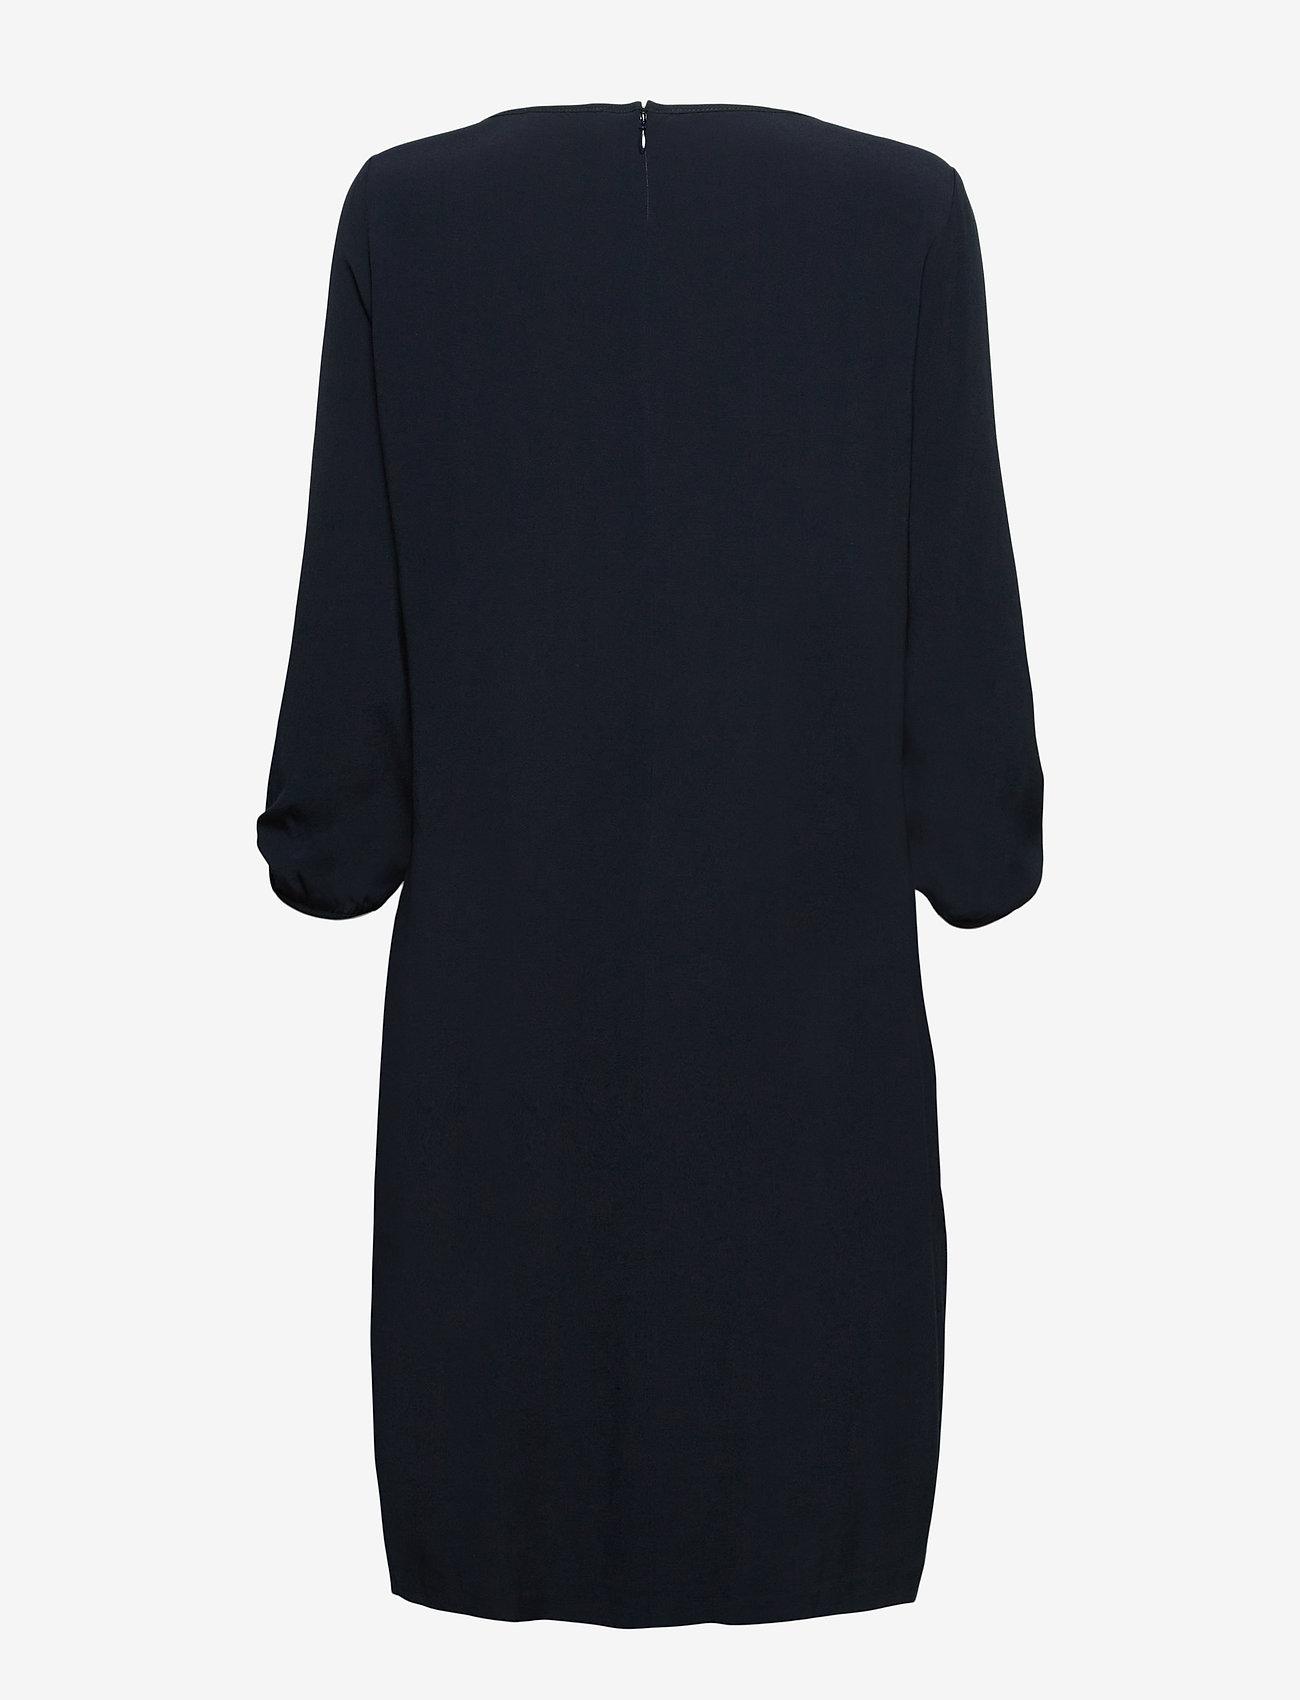 SAND - Crepe Satin Back - Ellie - robes de jour - medium blue - 1